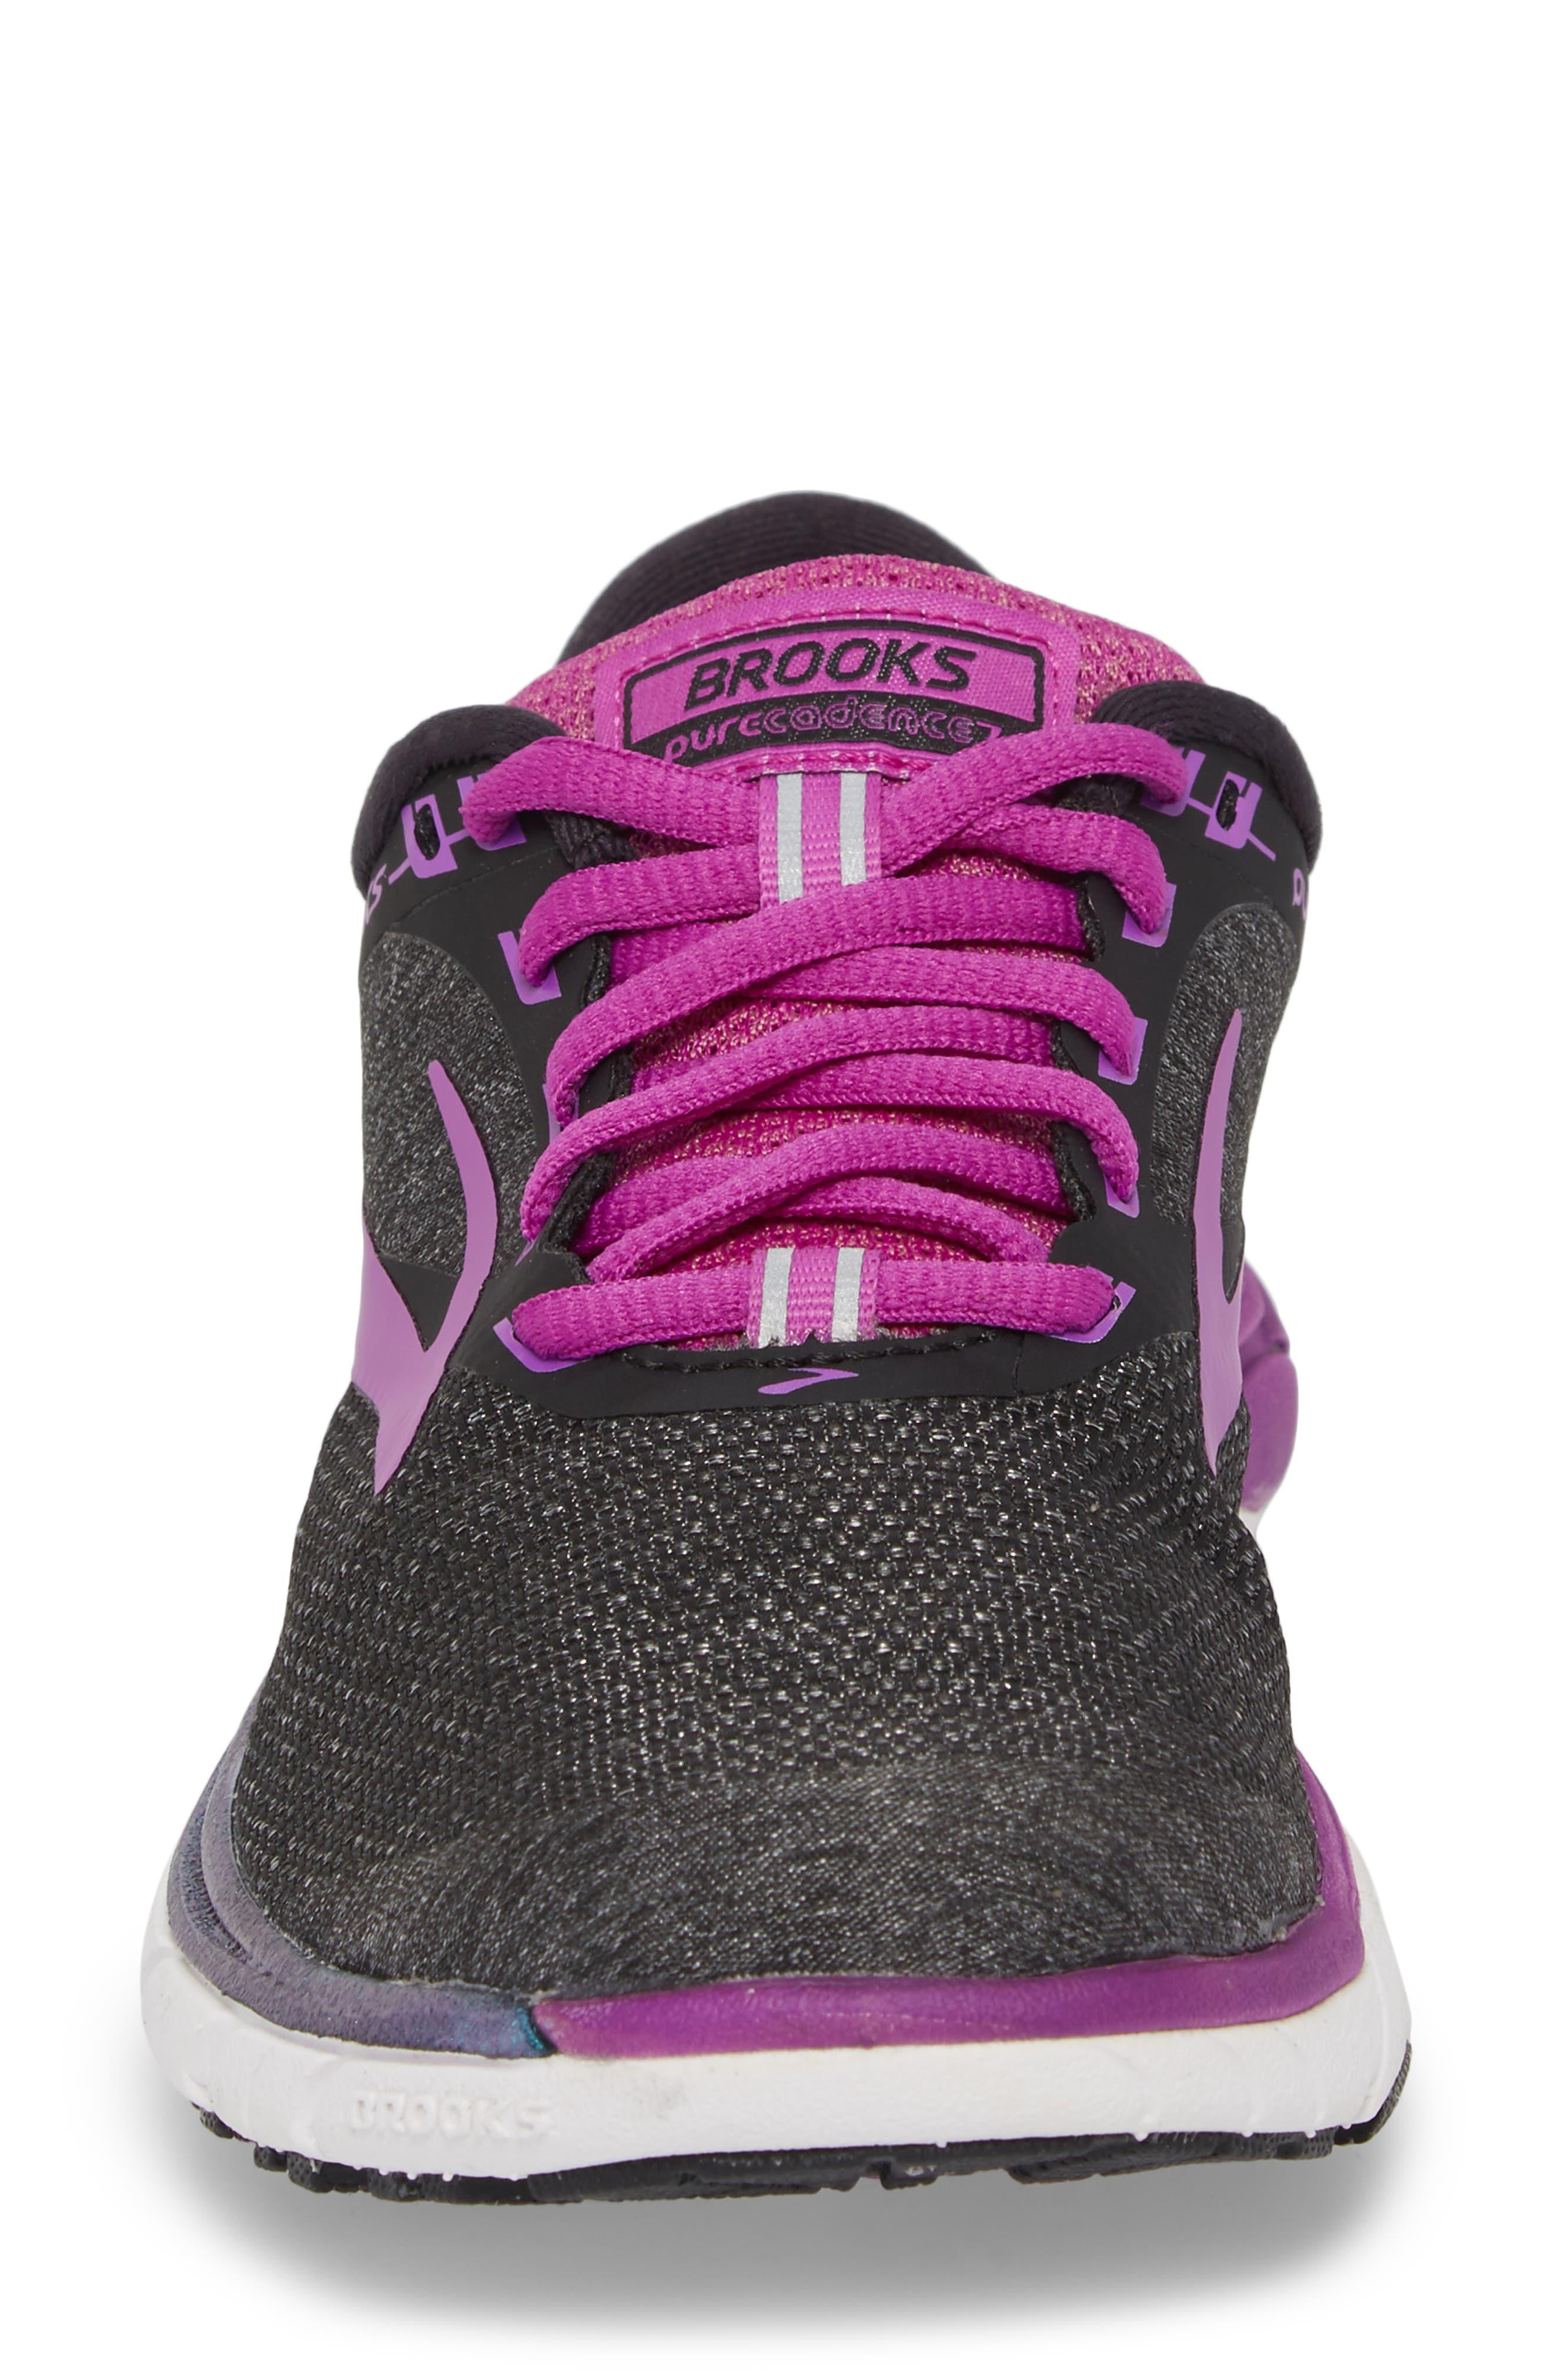 PureCadence 7 Road Running Shoe,                             Alternate thumbnail 4, color,                             BLACK/ PURPLE/ MULTI